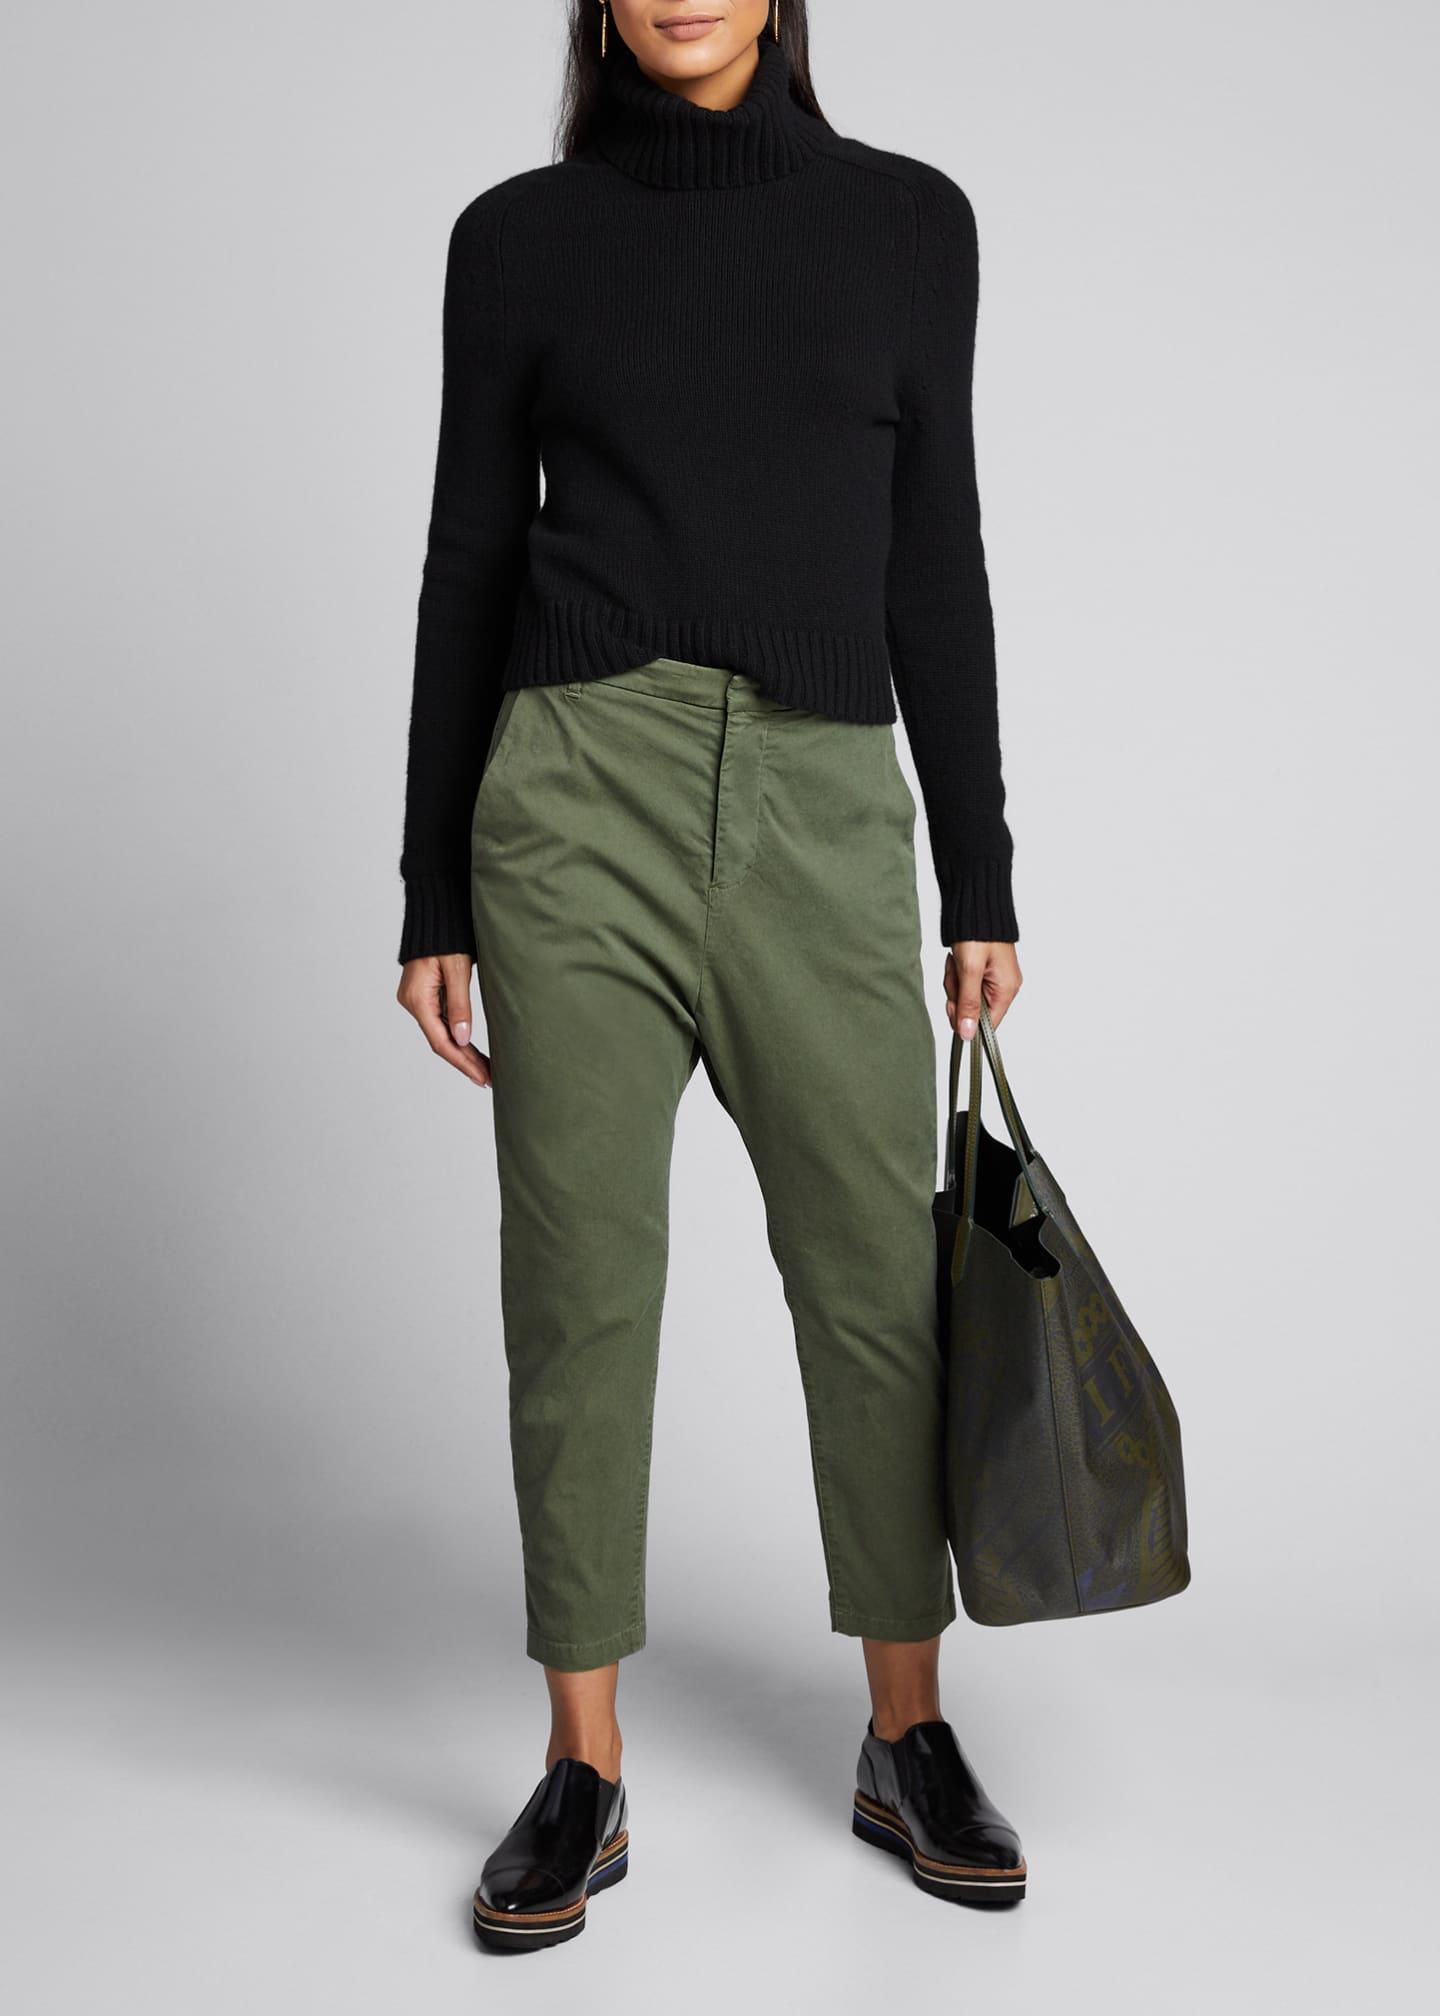 Nili Lotan Paris Straight-Leg Cropped Pants